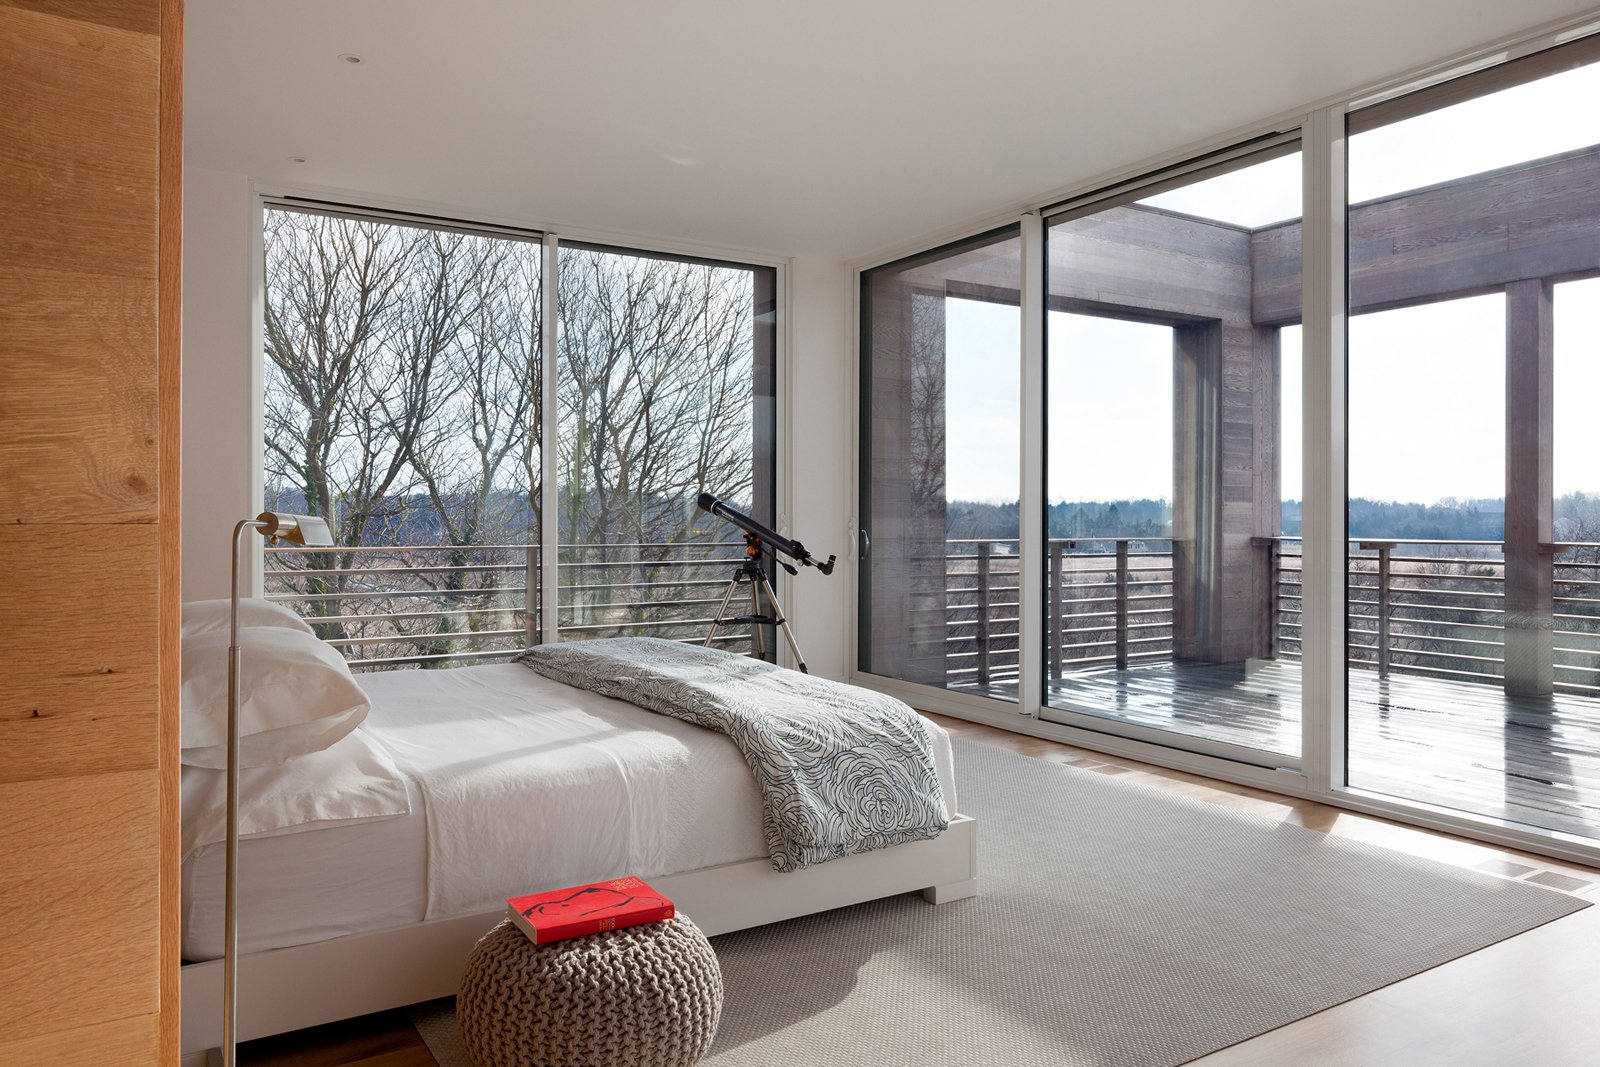 Shining Examples of Clerestory Windows by Luke Hopping